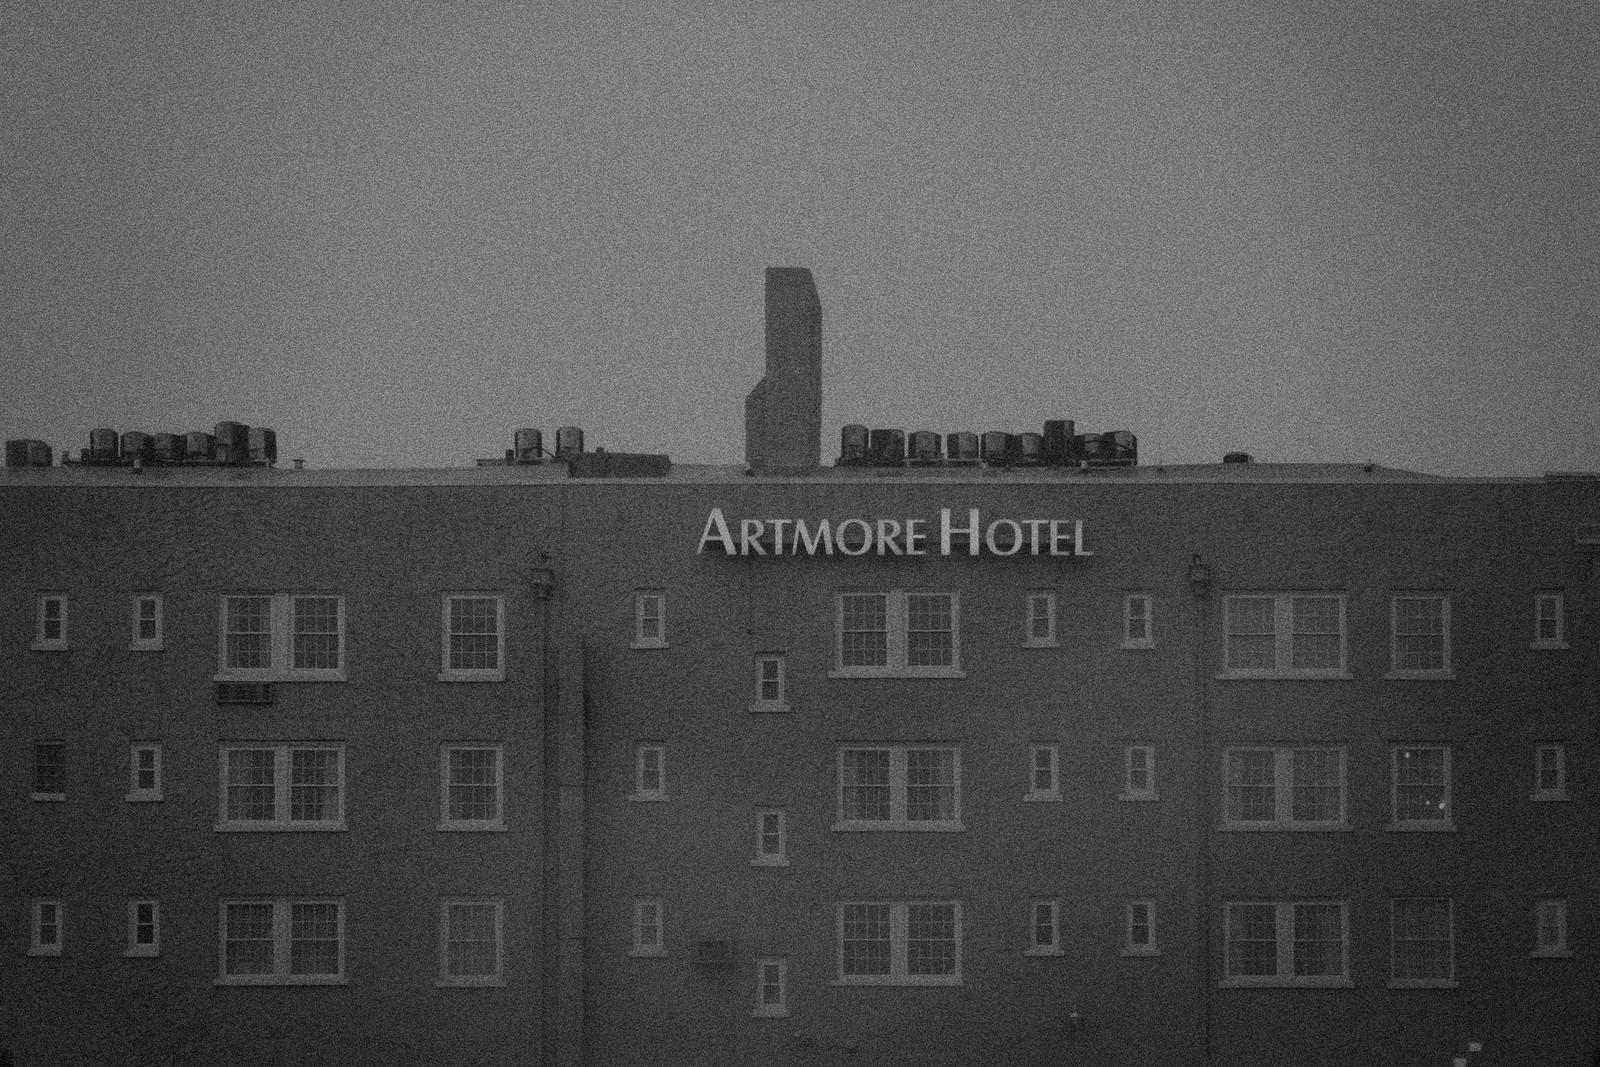 Artmore Hotel, Midtown Atlanta, August 2014